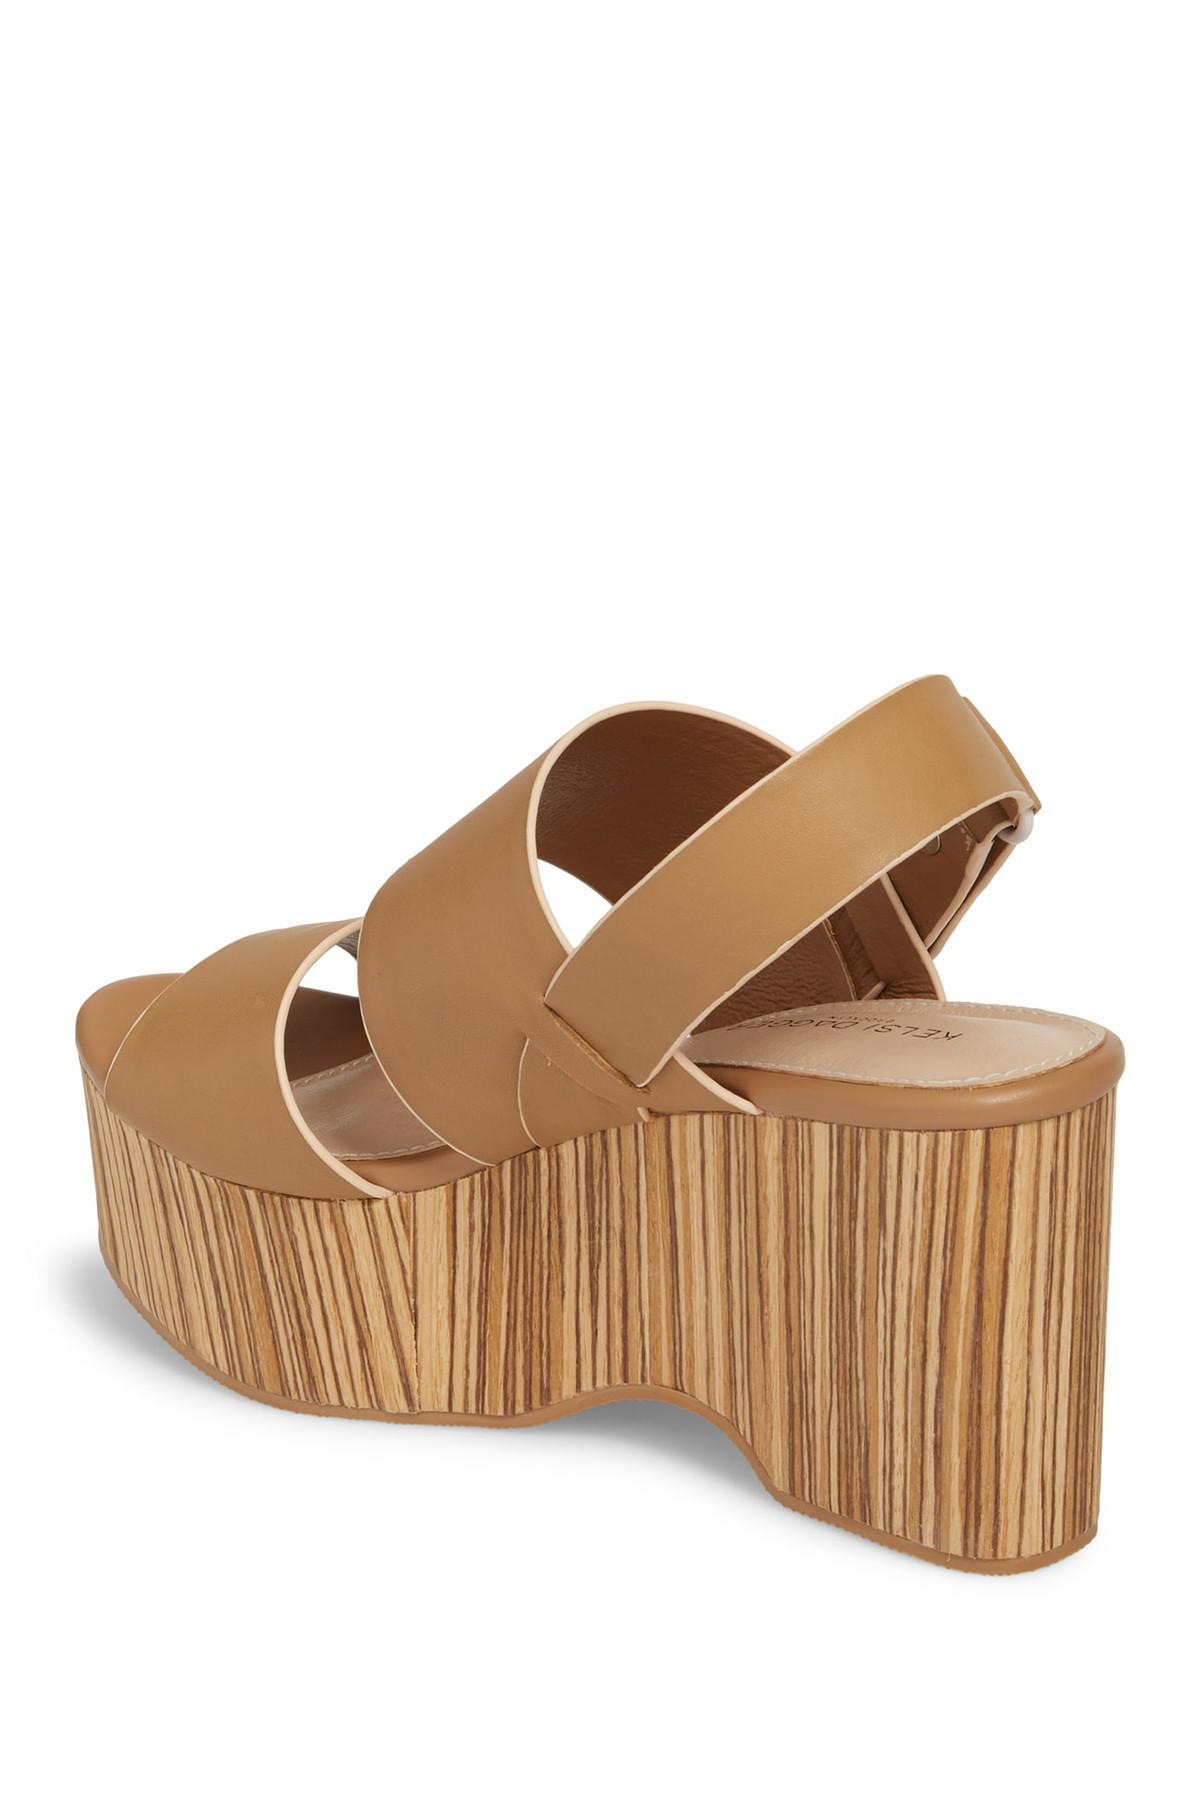 01ad1489d7c Kelsi Dagger Brooklyn - Brown Nash Platform Wedge Sandal (women) - Lyst.  View fullscreen